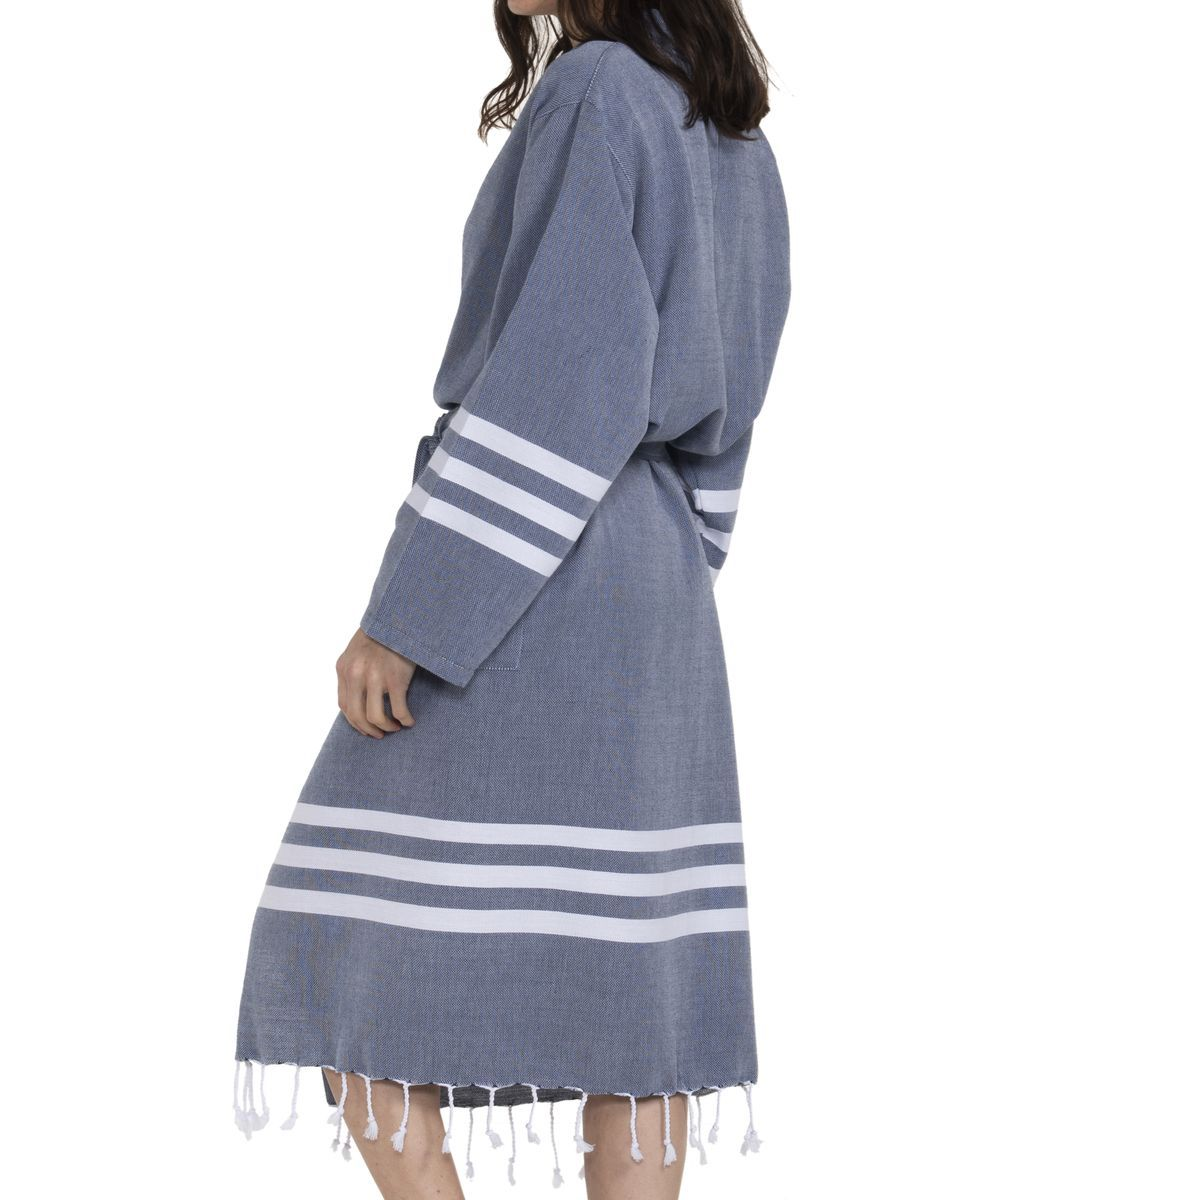 Bathrobe Bala Sultan kimono - Navy